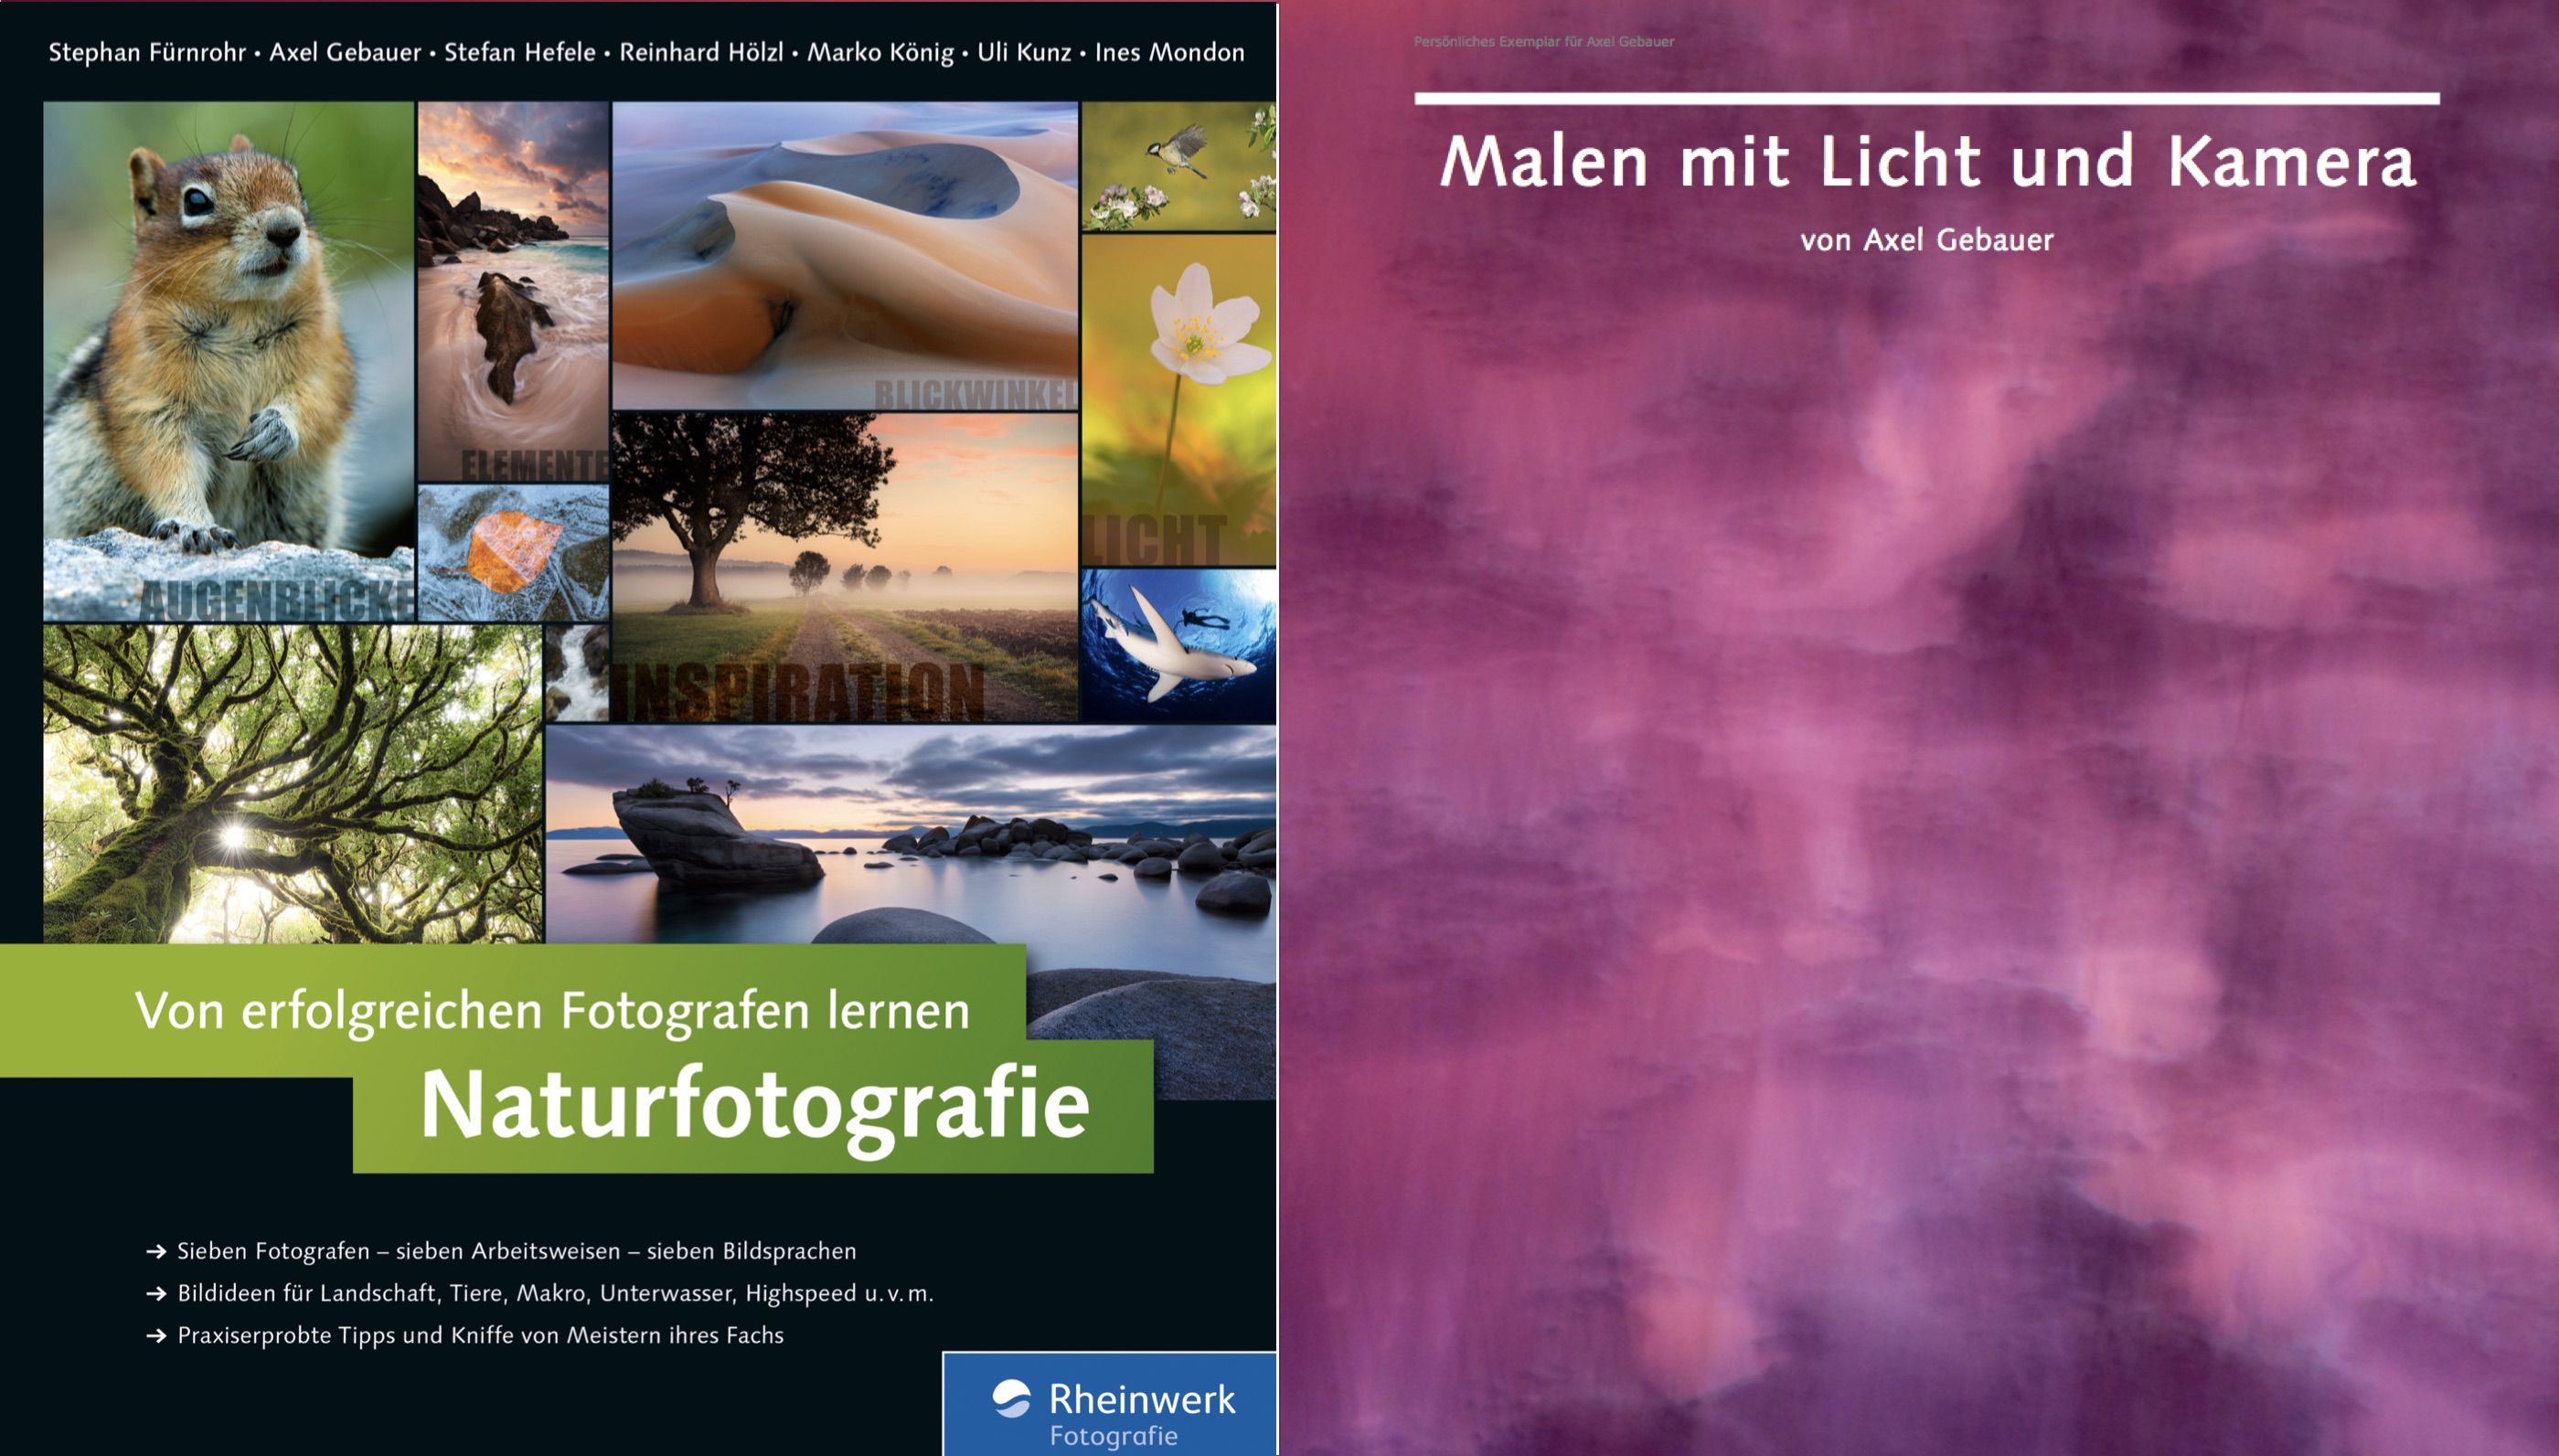 NaturfotografieRheinwerk2015